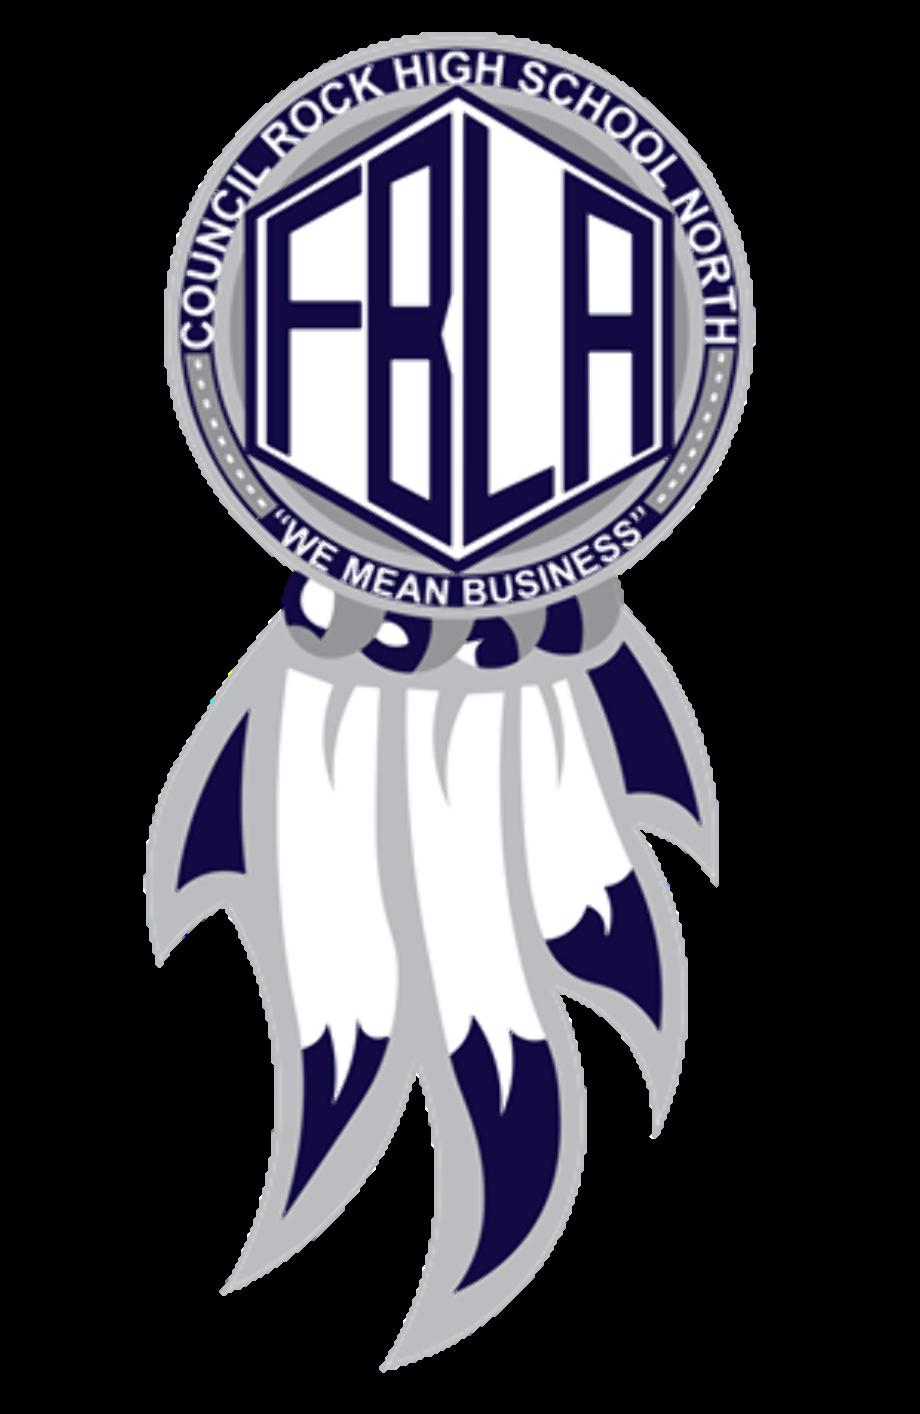 Fbla logo symbol sherpinsky